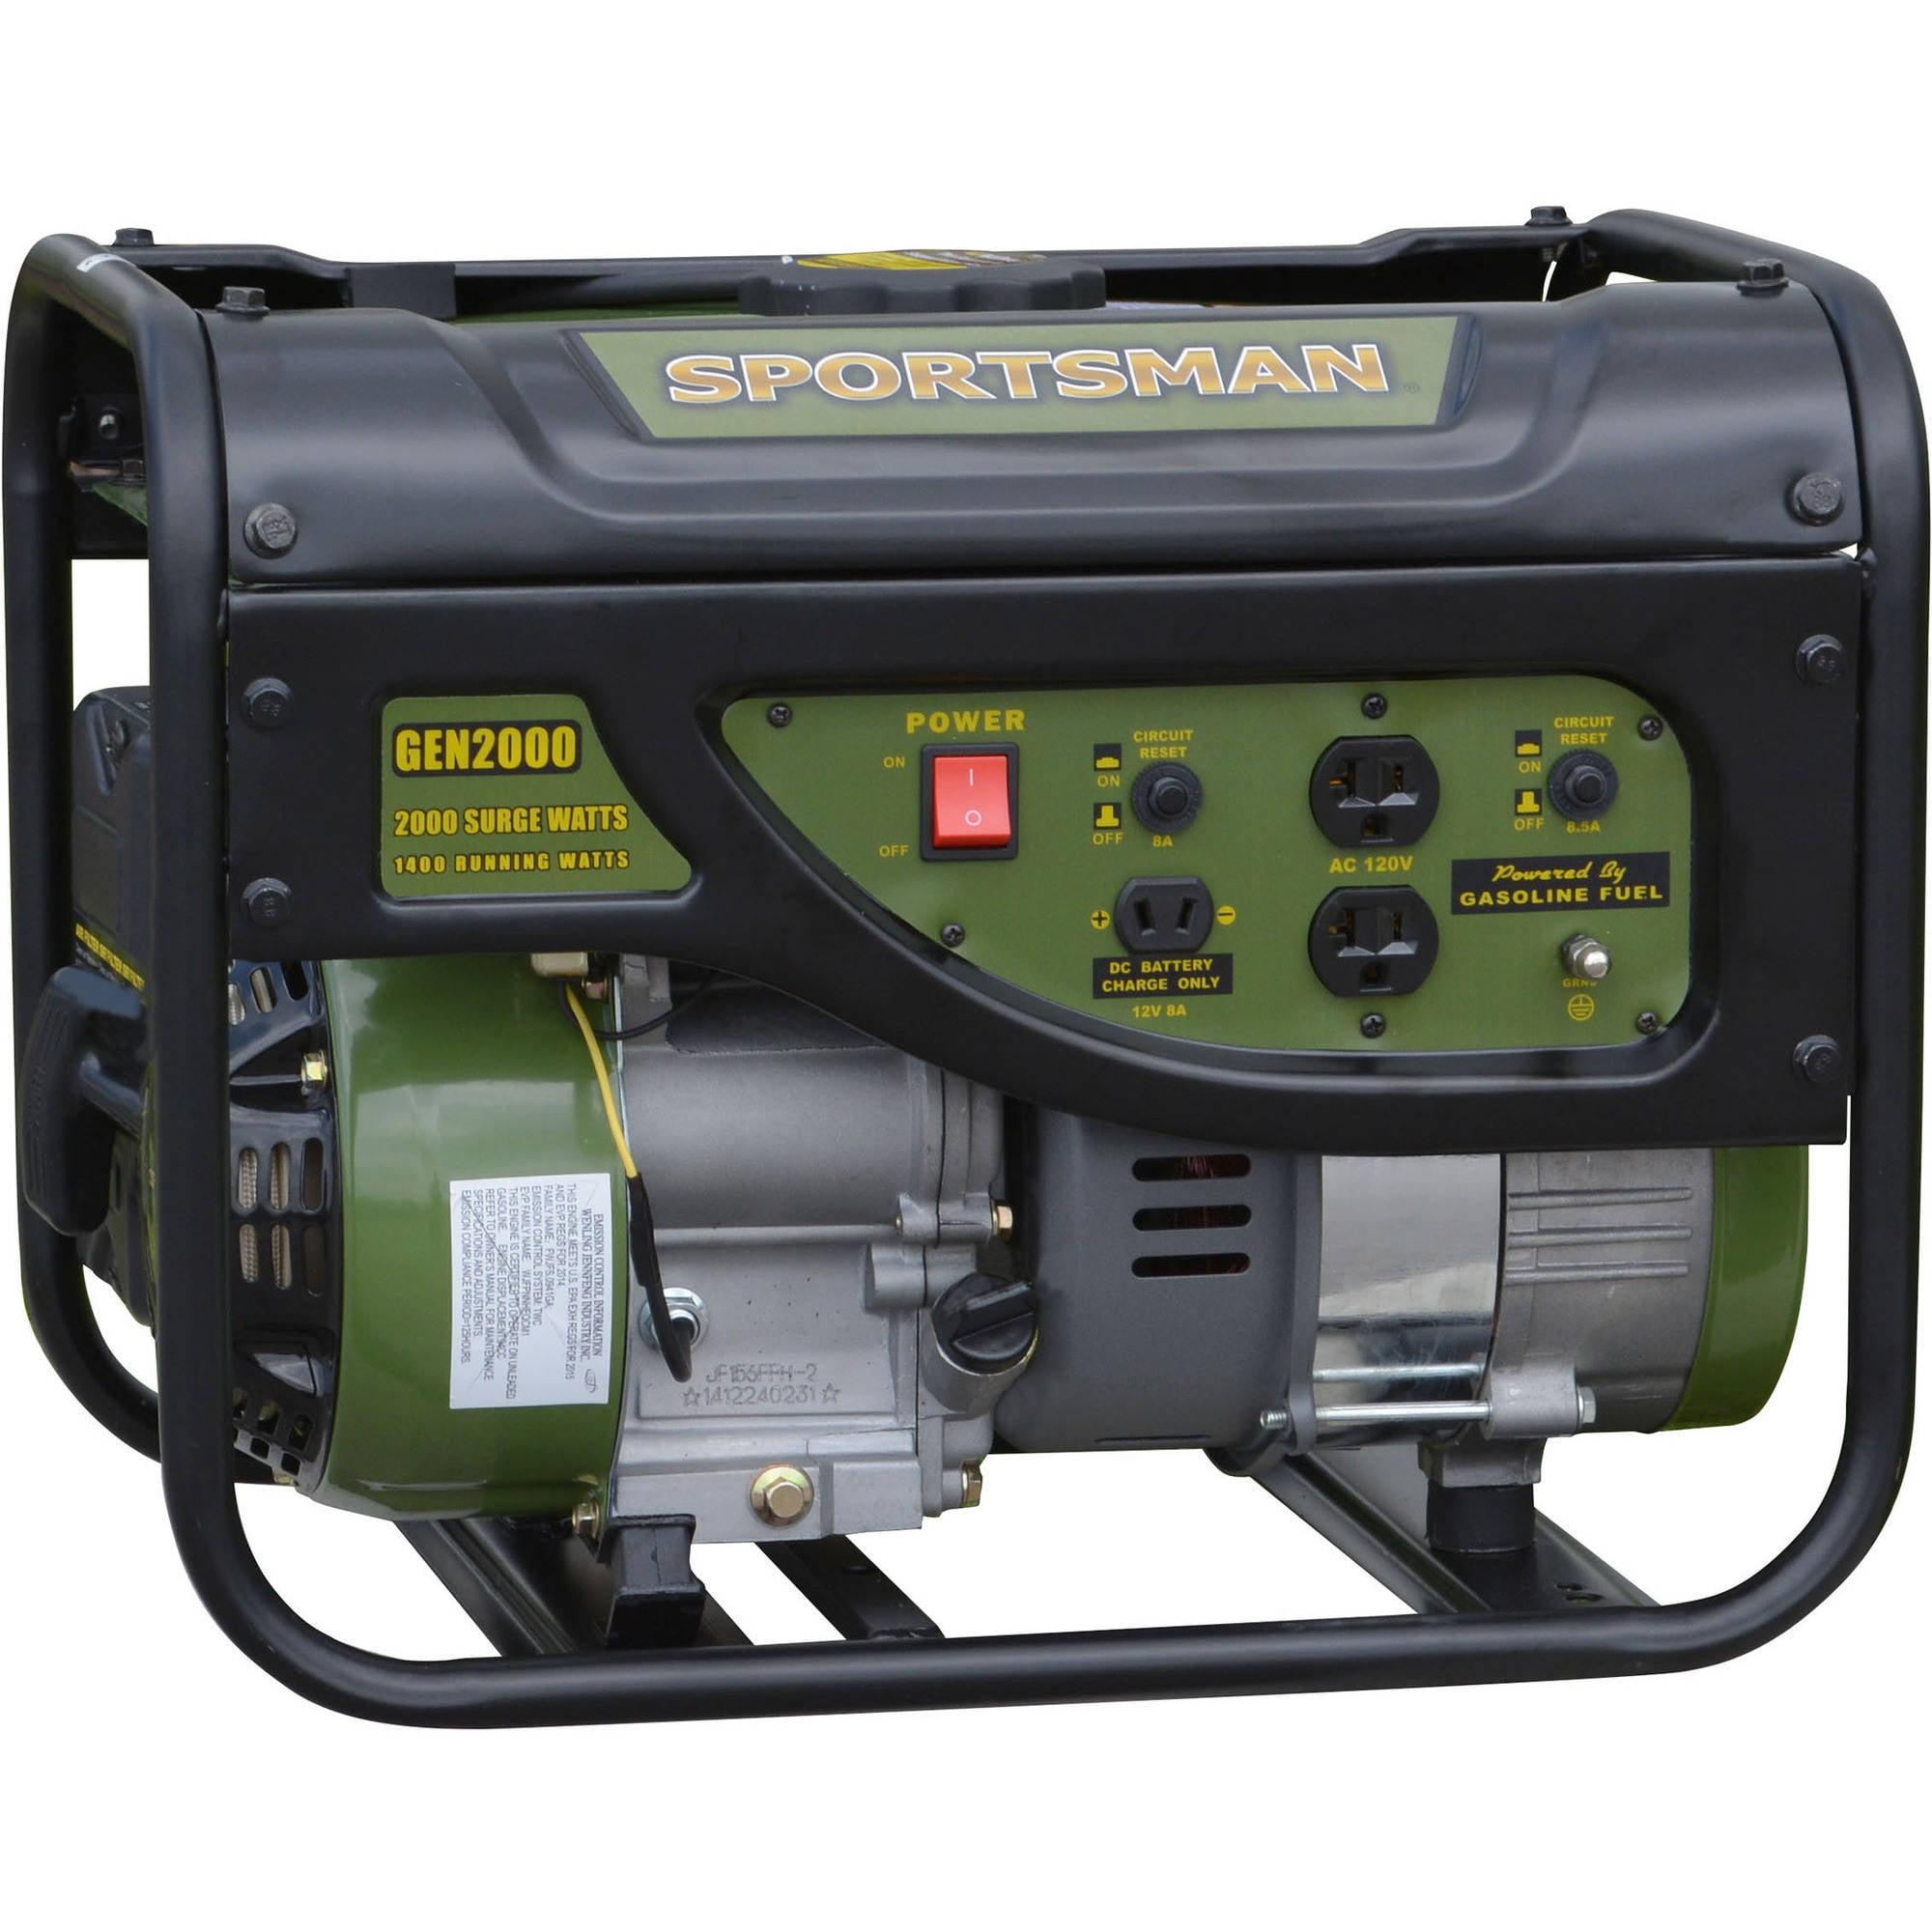 Sportsman Gasoline 4000W Portable Generator Walmartcom